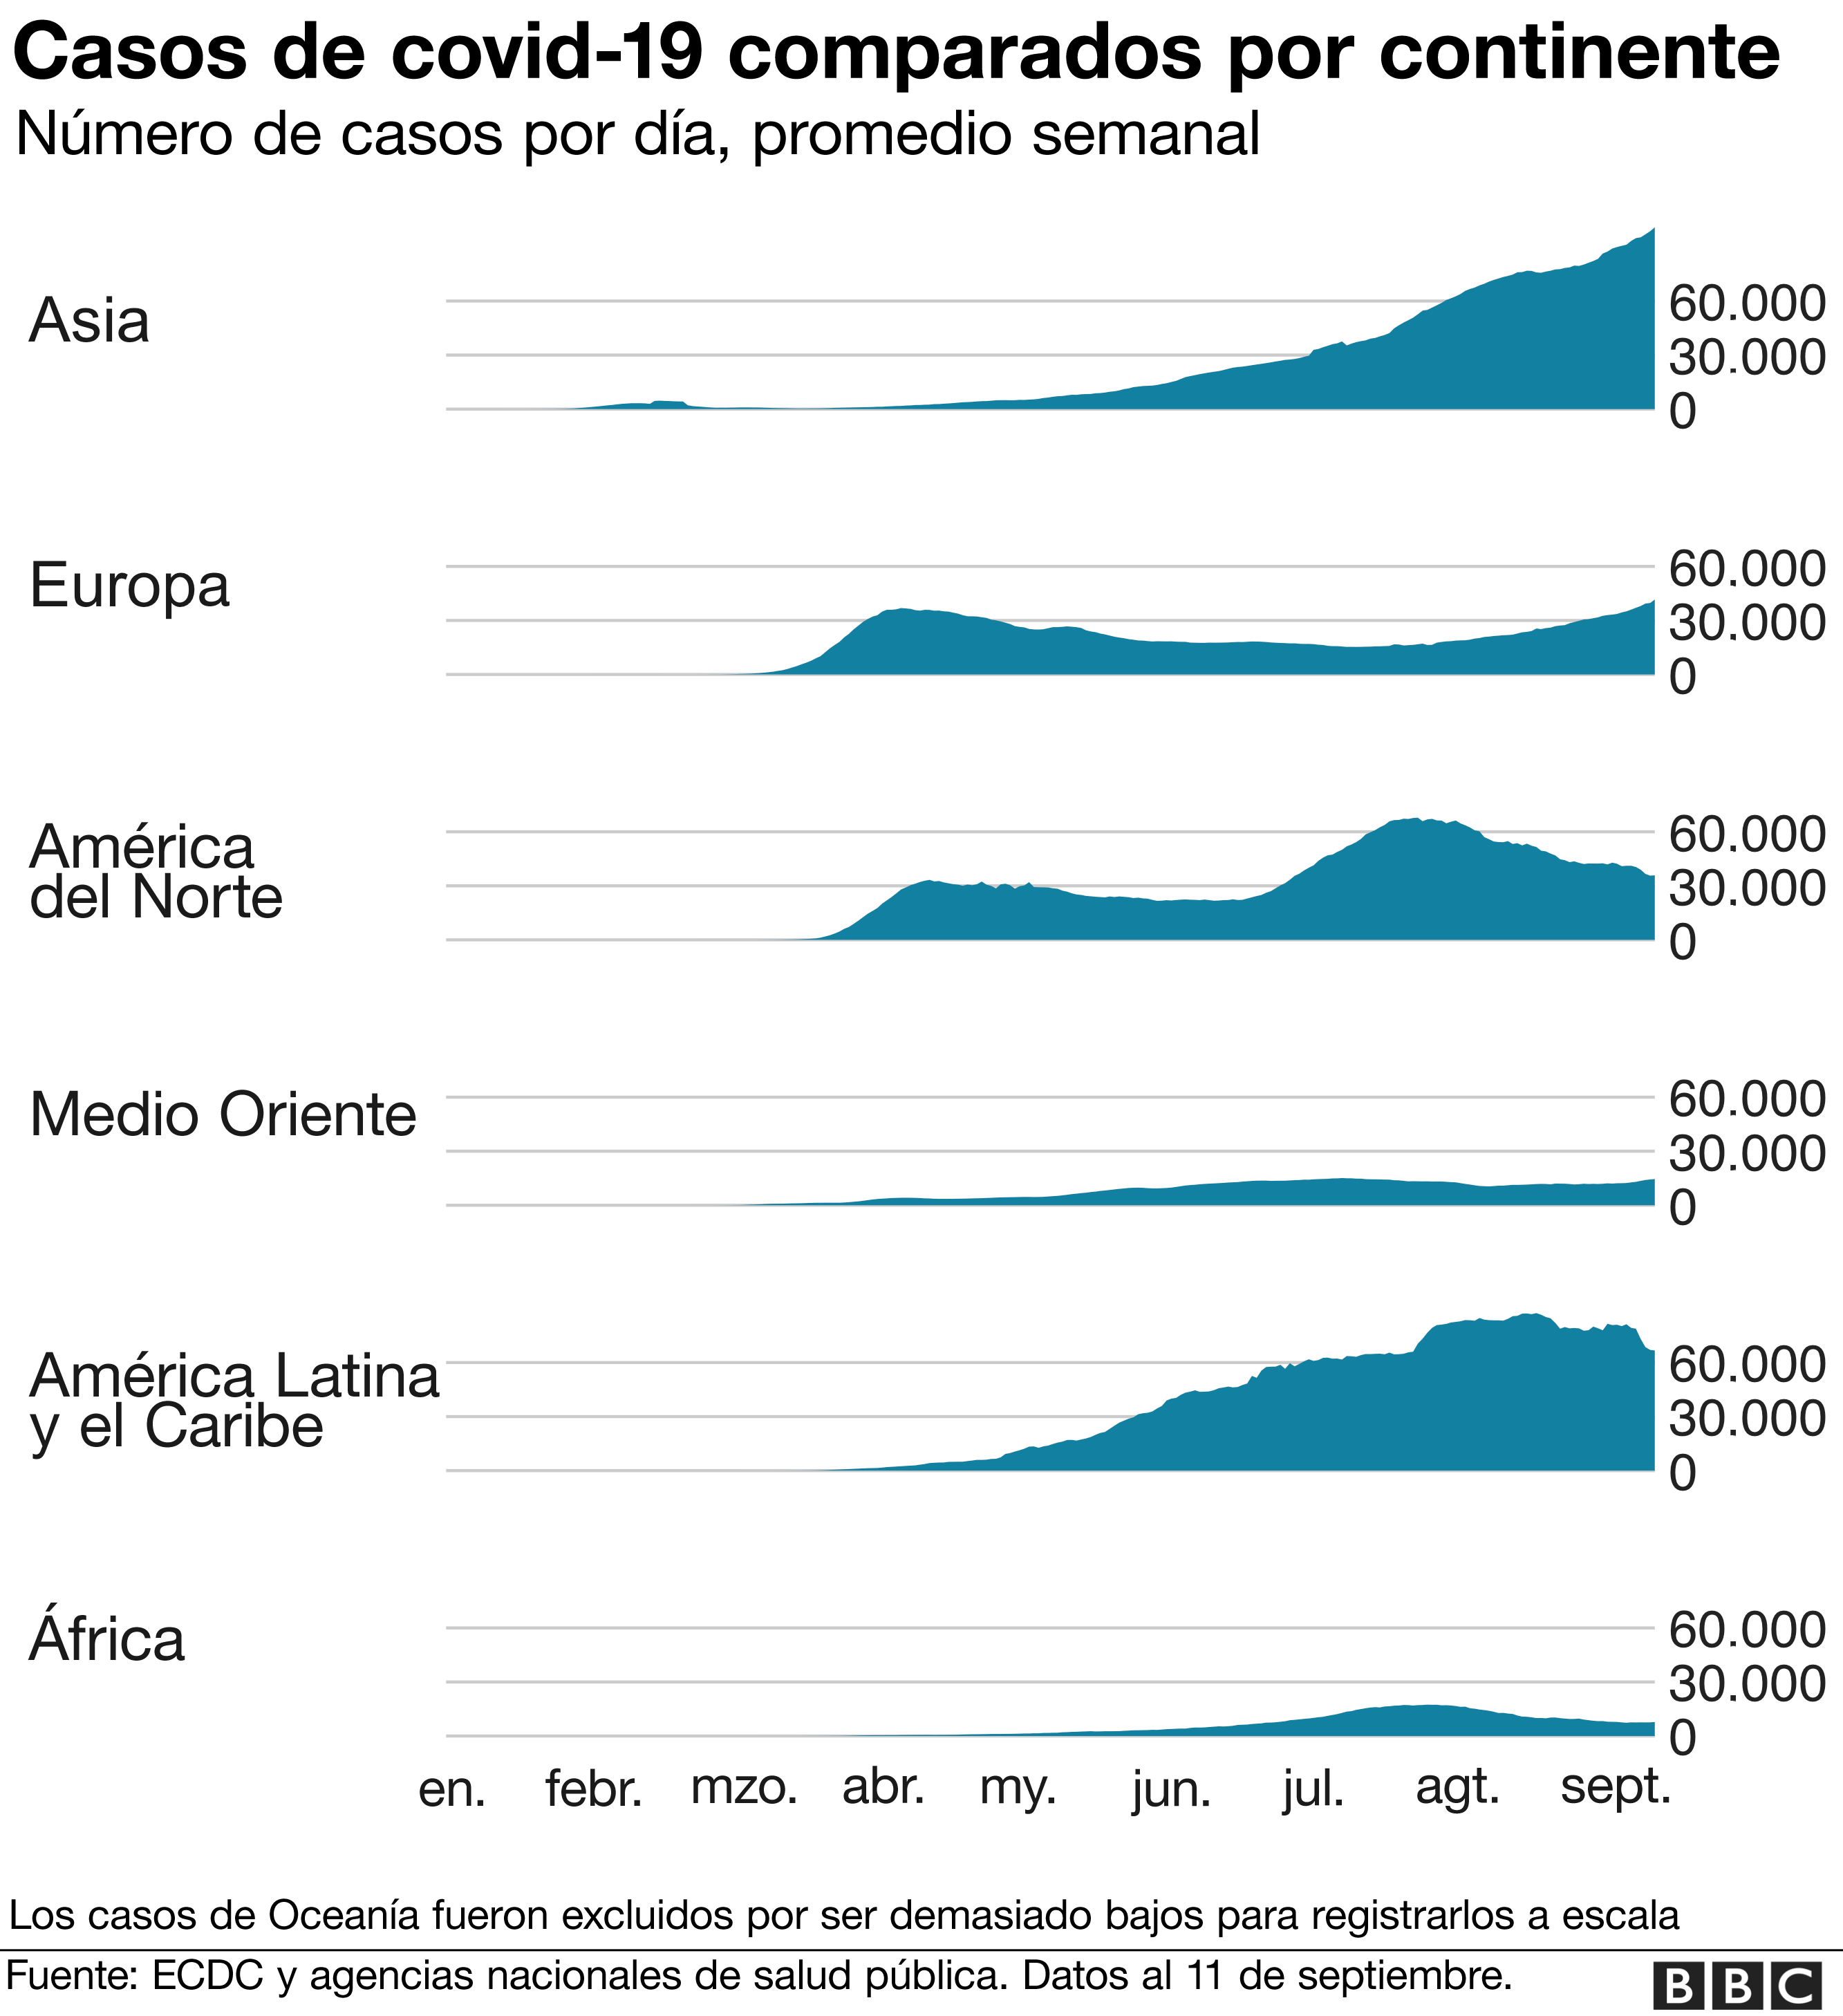 Casos de covid-19 comparados por continente